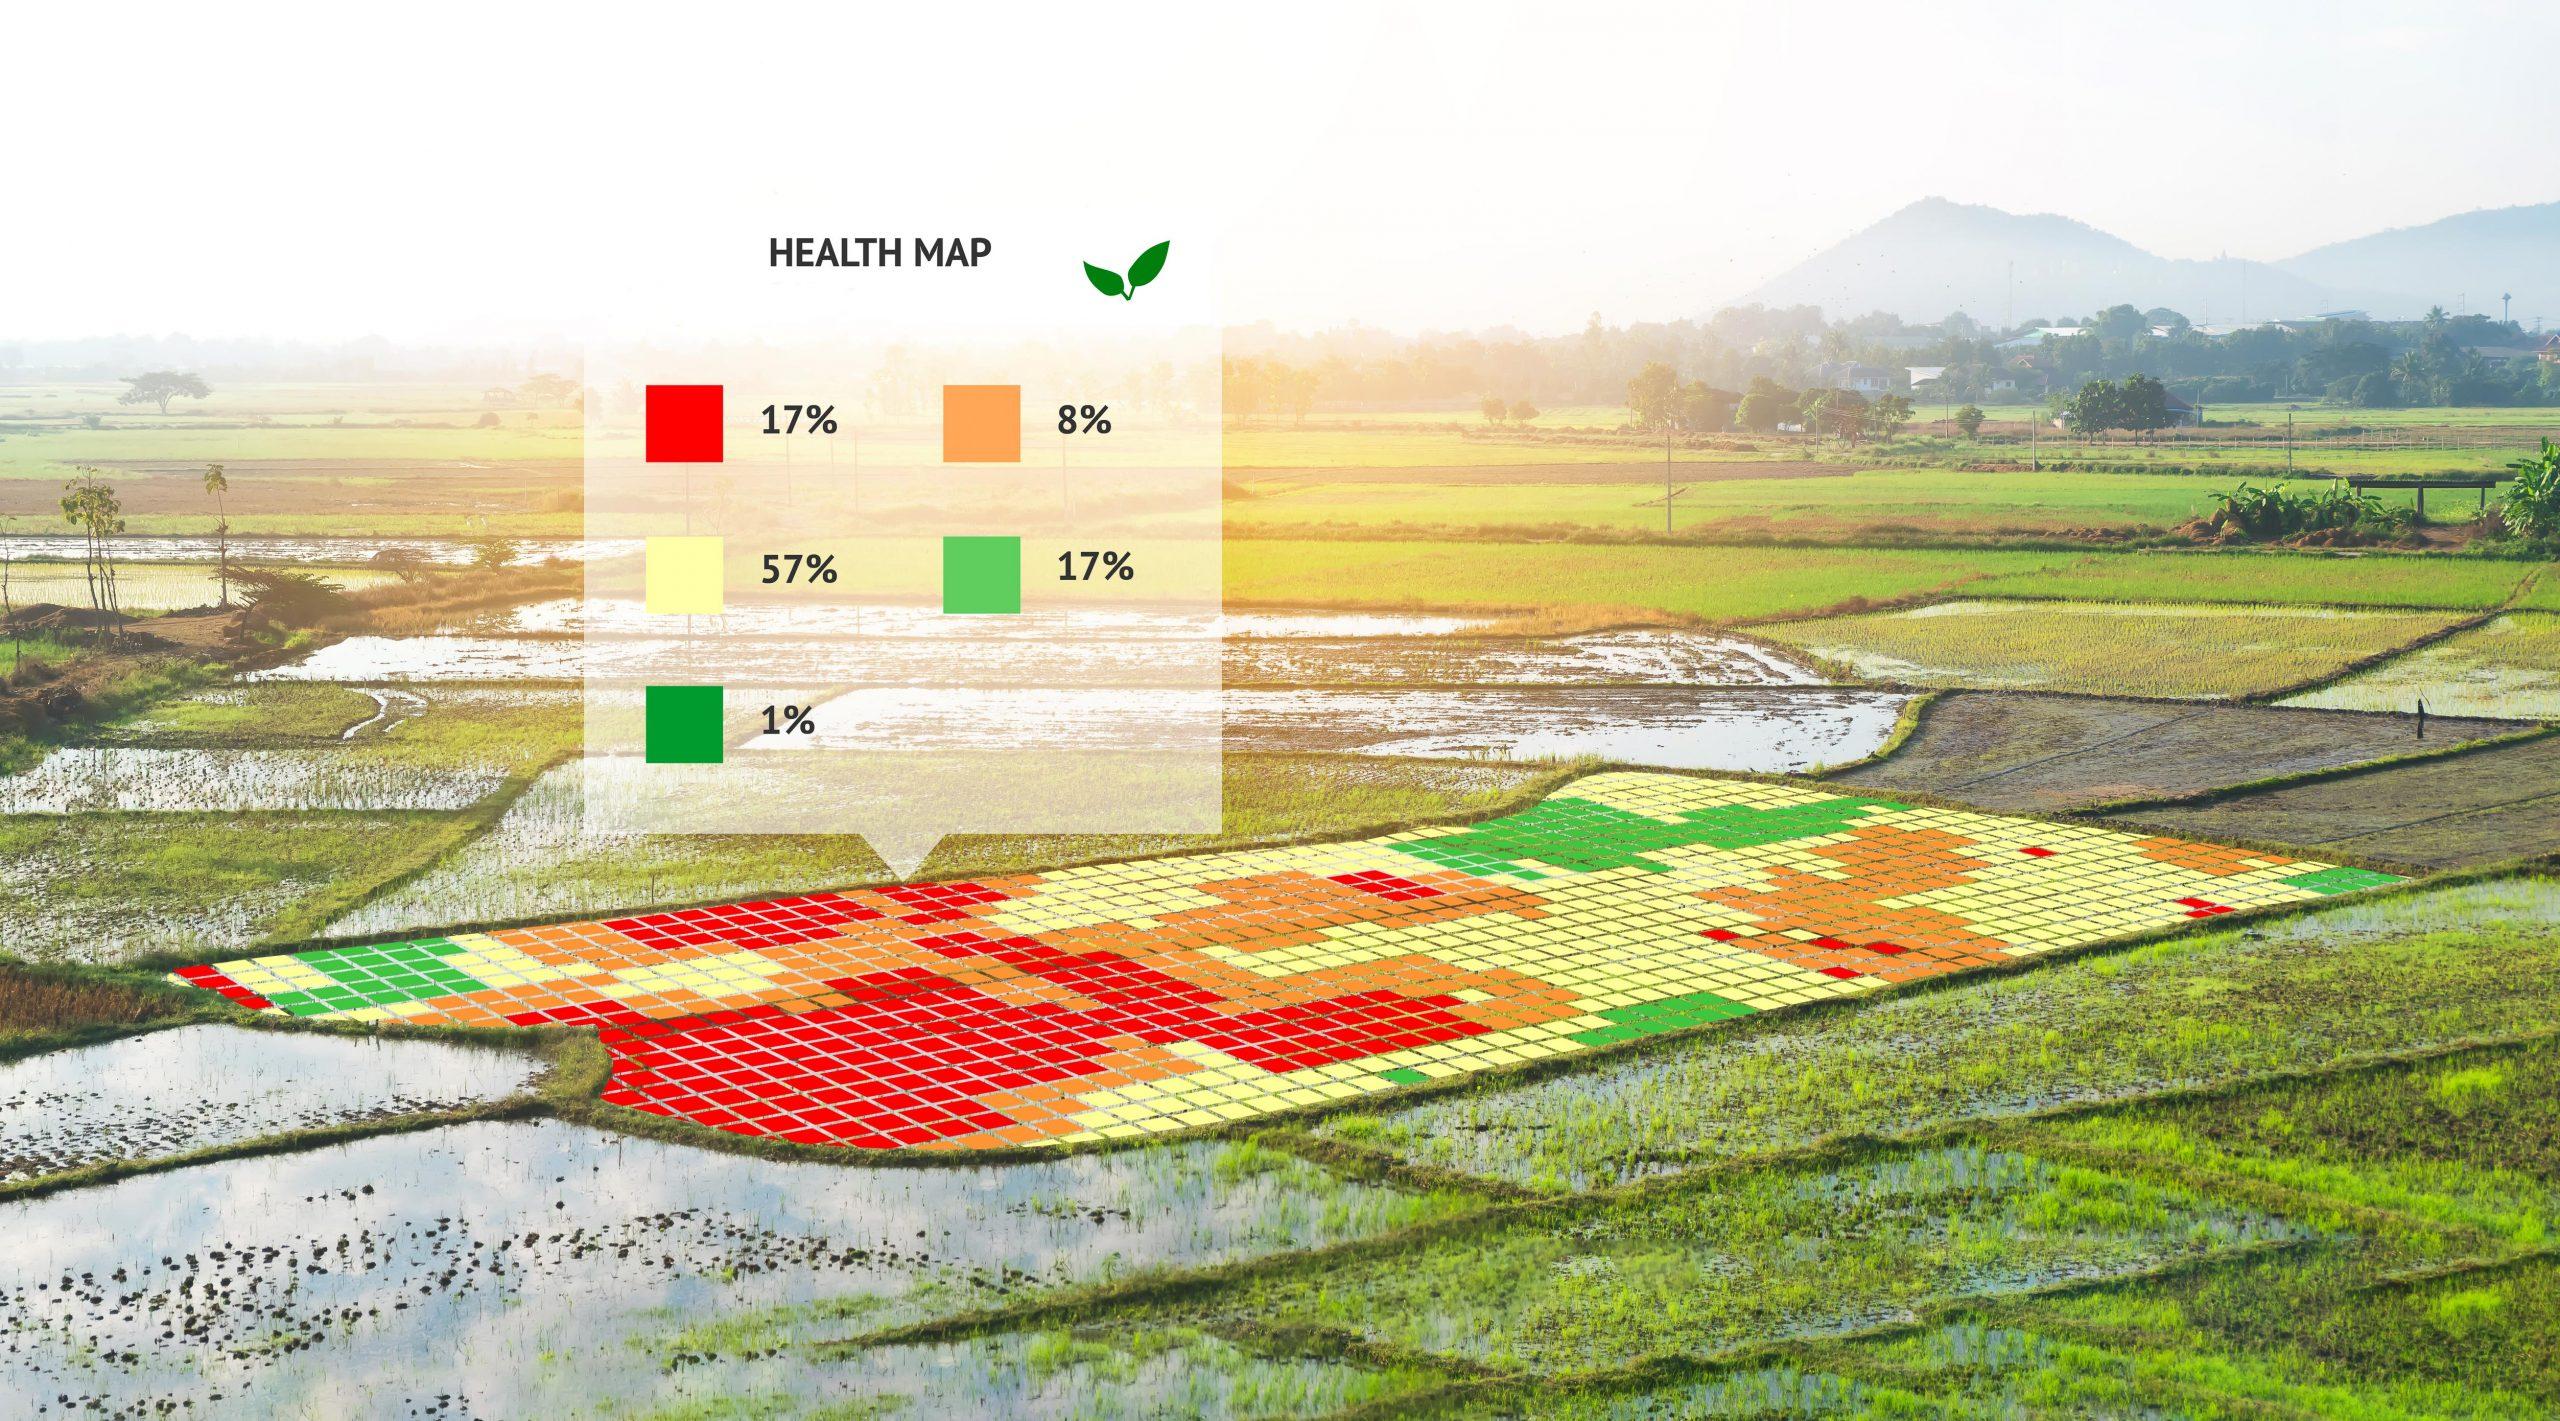 Crop Health Pixe by Pixle